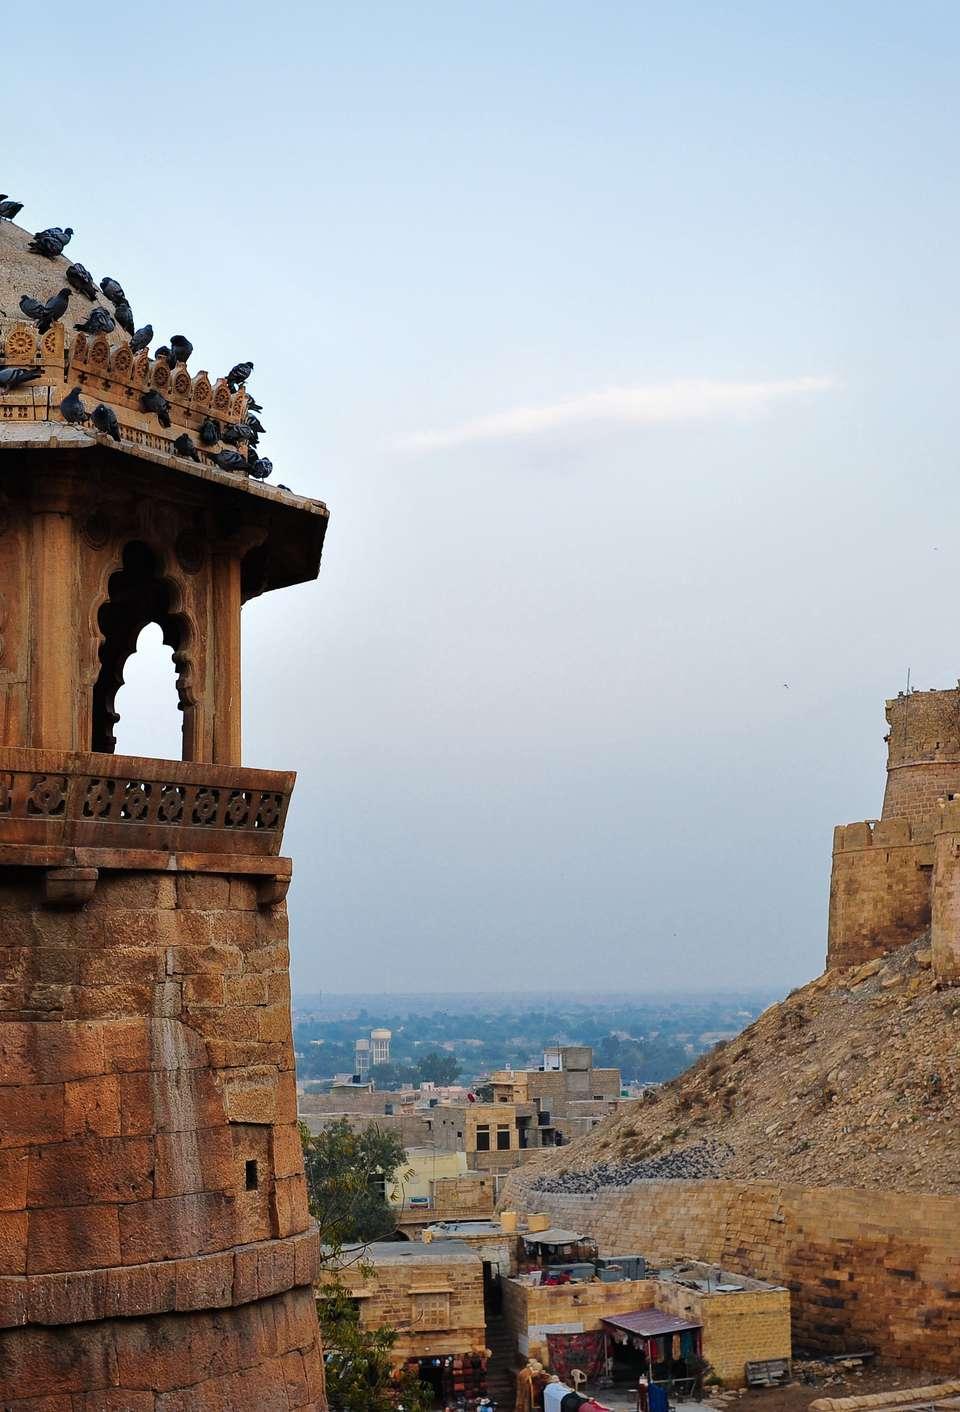 A beautiful detail on a building near Jaisalmer Fort, Jaisalmer, India